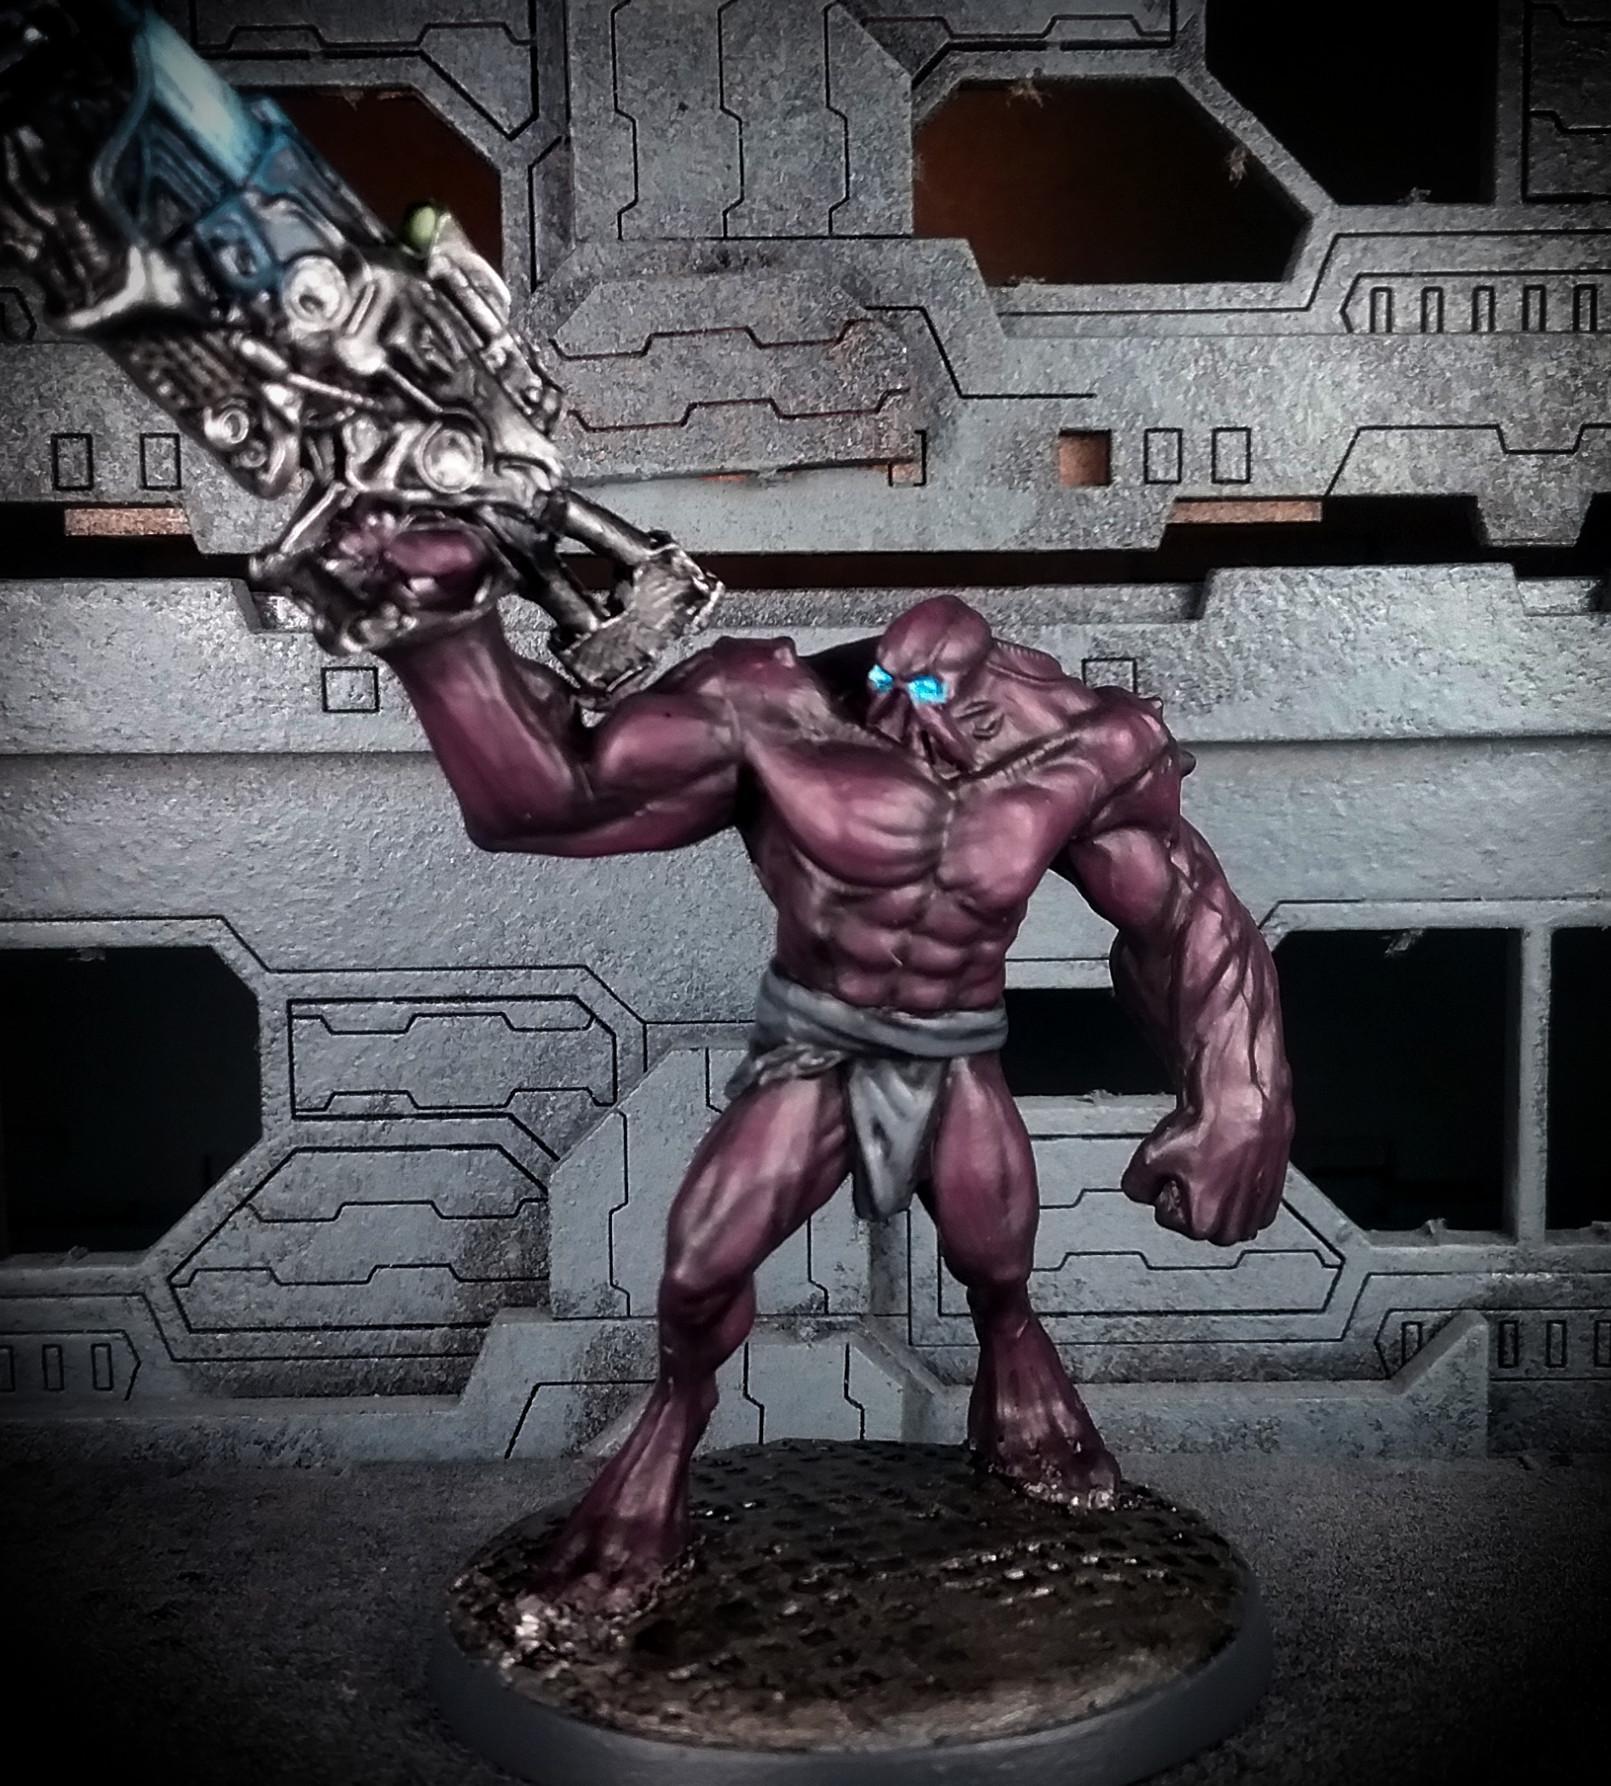 Brute, Dark Legion, Mutant, Ogryns, Razide, Warzone, Warzone: Mutant Chronicles, Warzone: Resurrection